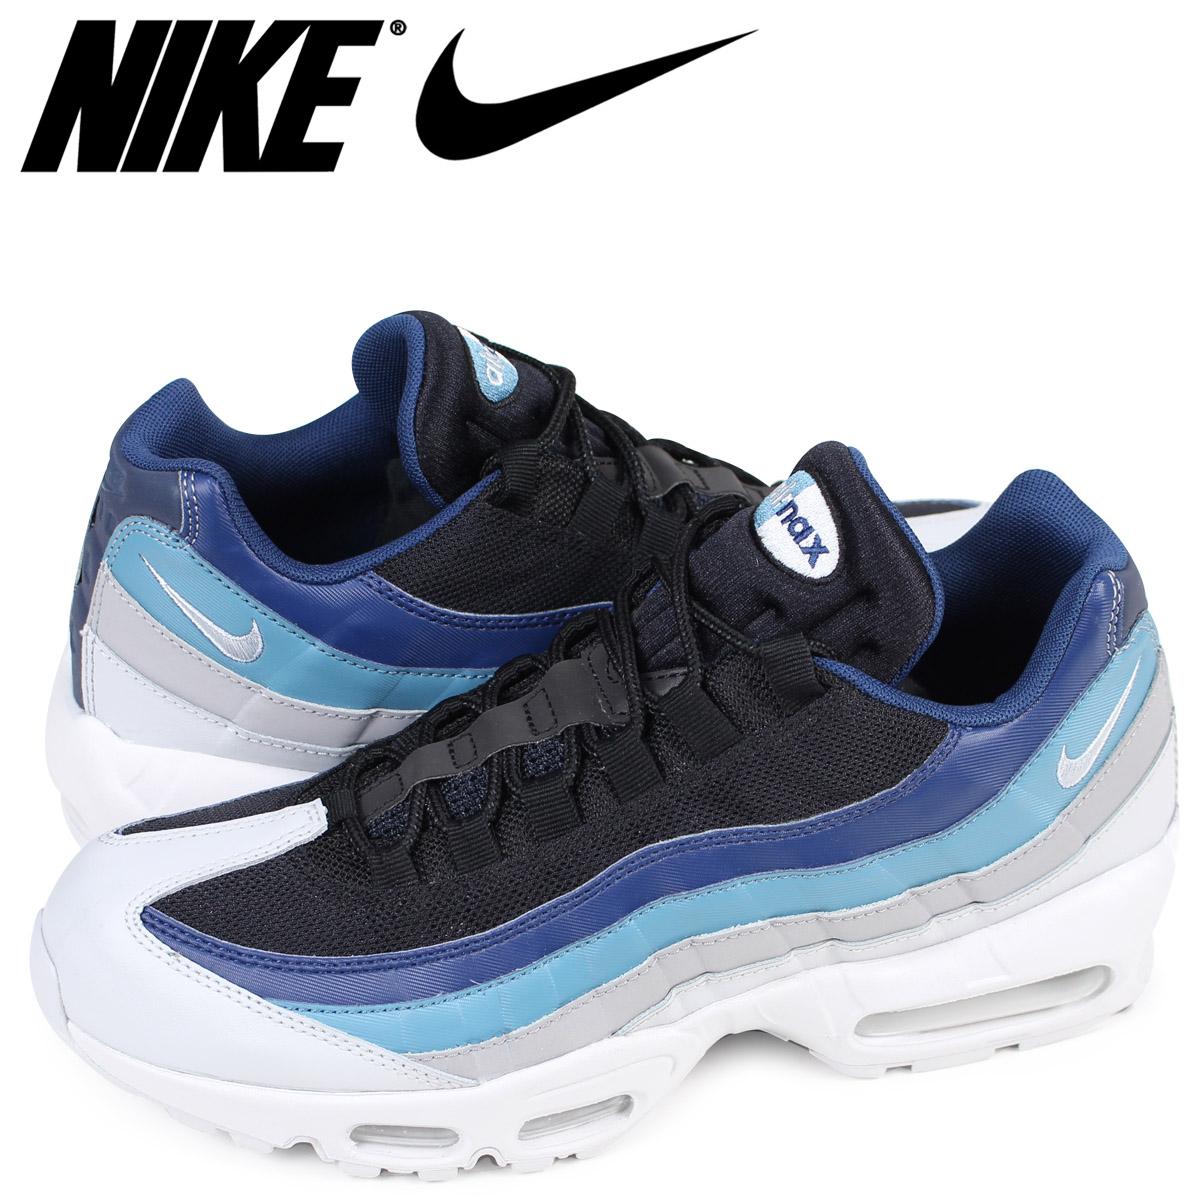 Nike Air Max 95 Prix Philippines Ventilateurs Rechargeables